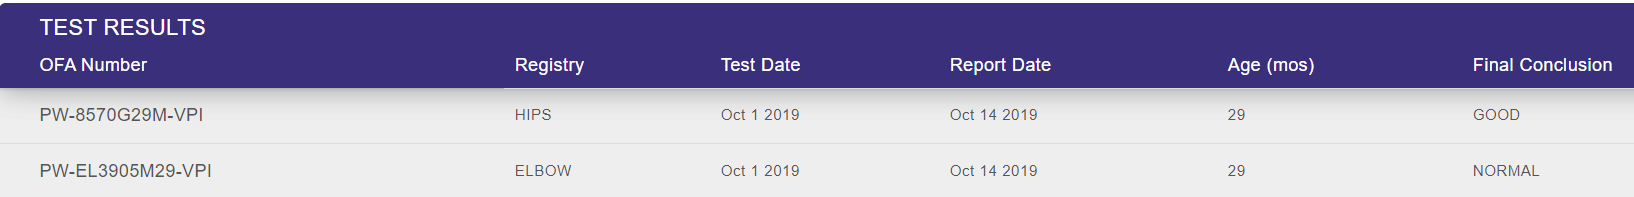 Jaco's OFA Health Test